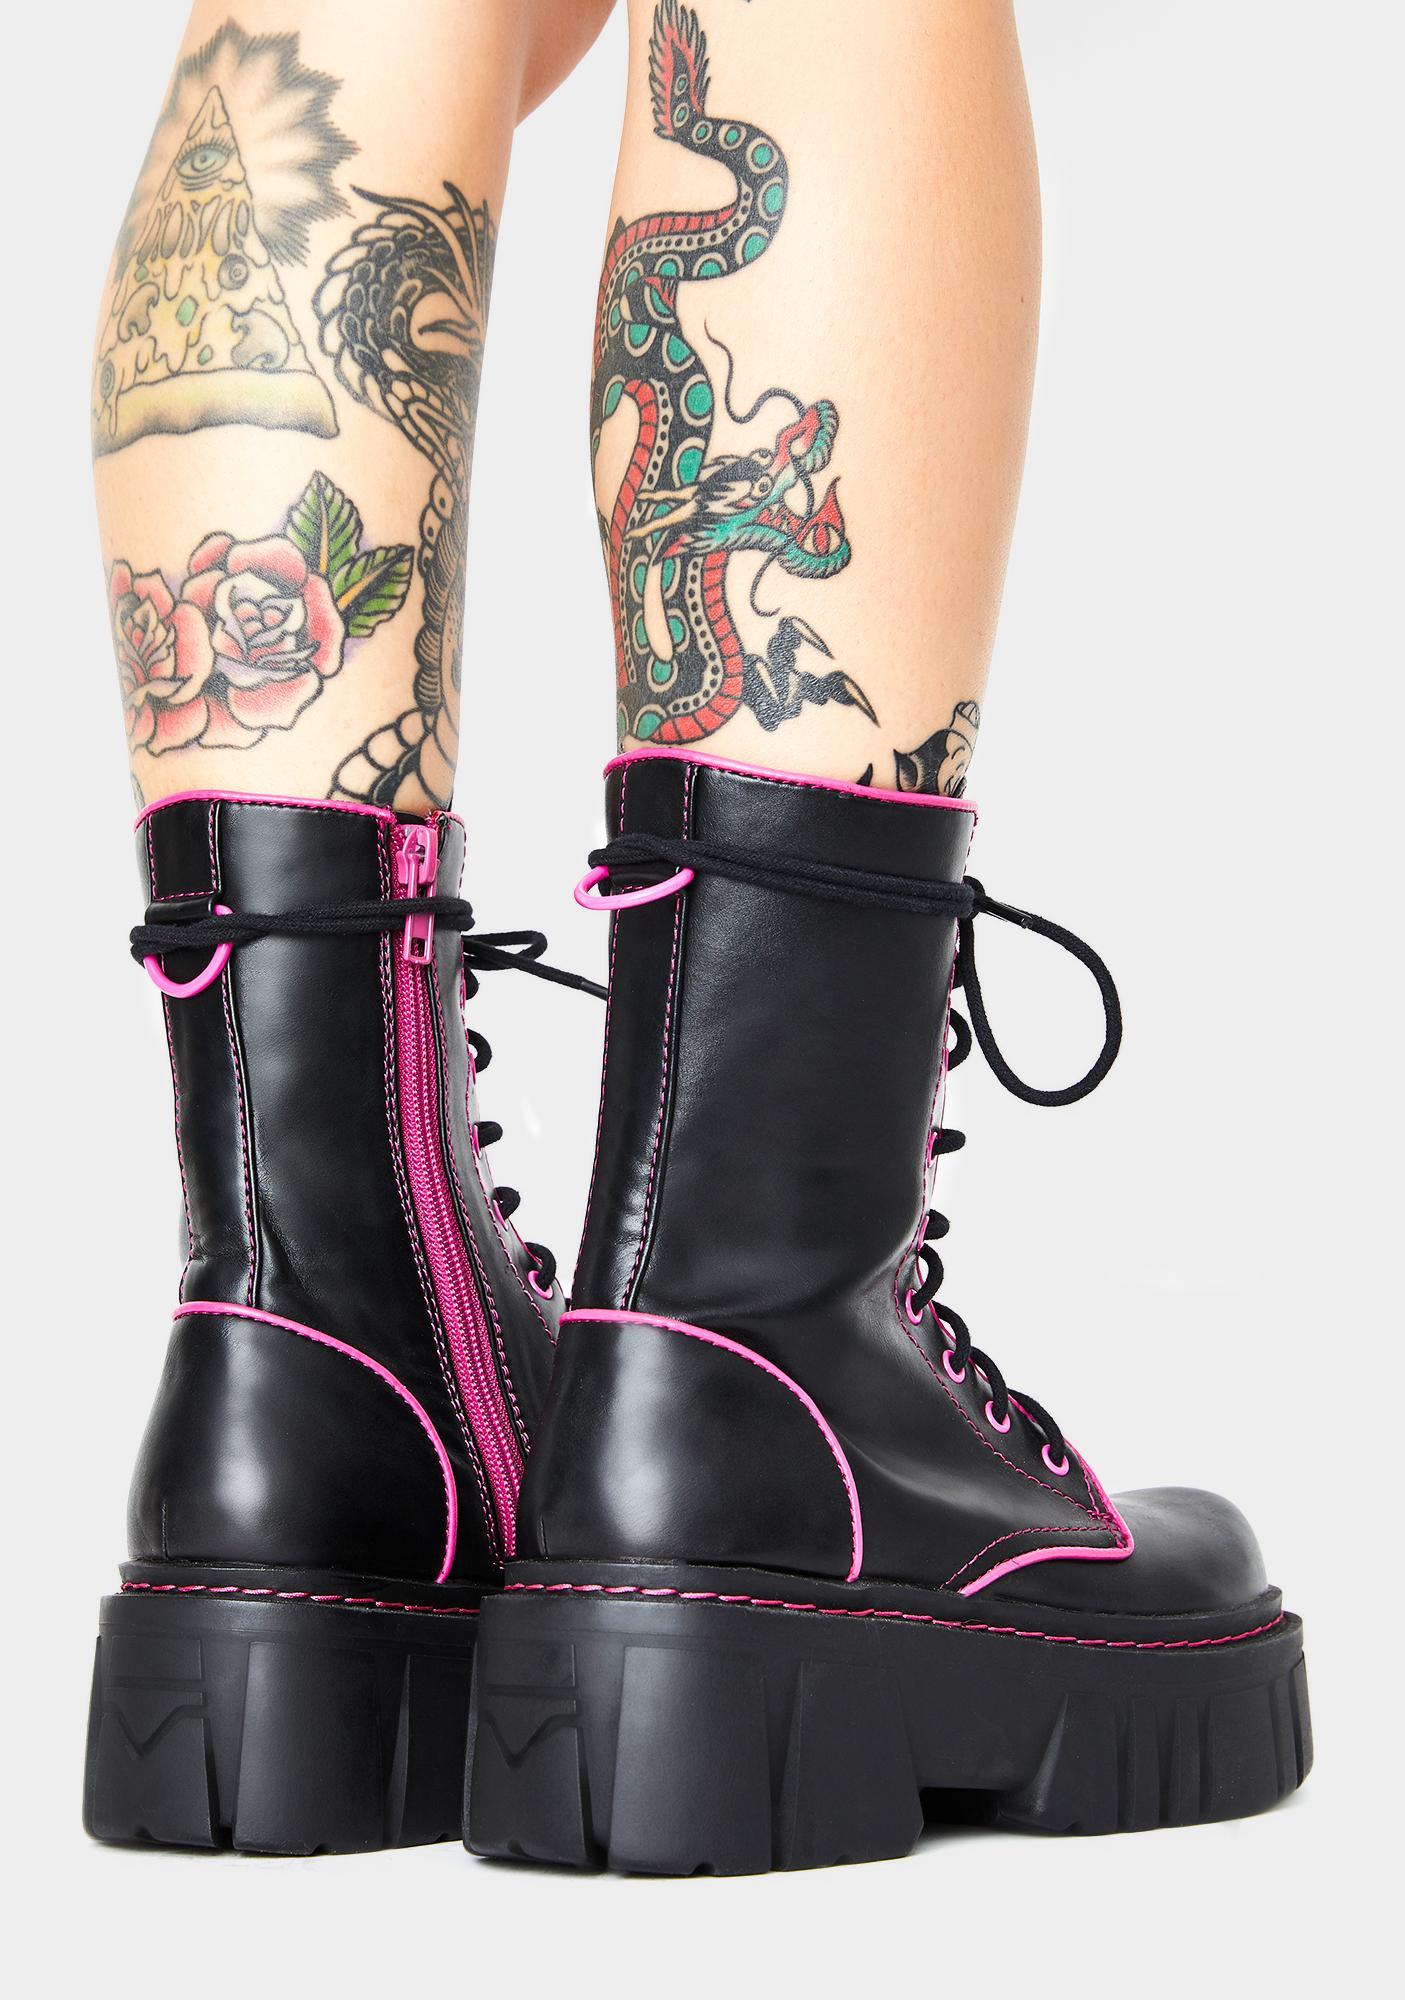 HOROSCOPEZ Licensed Trailblazer Combat Boots